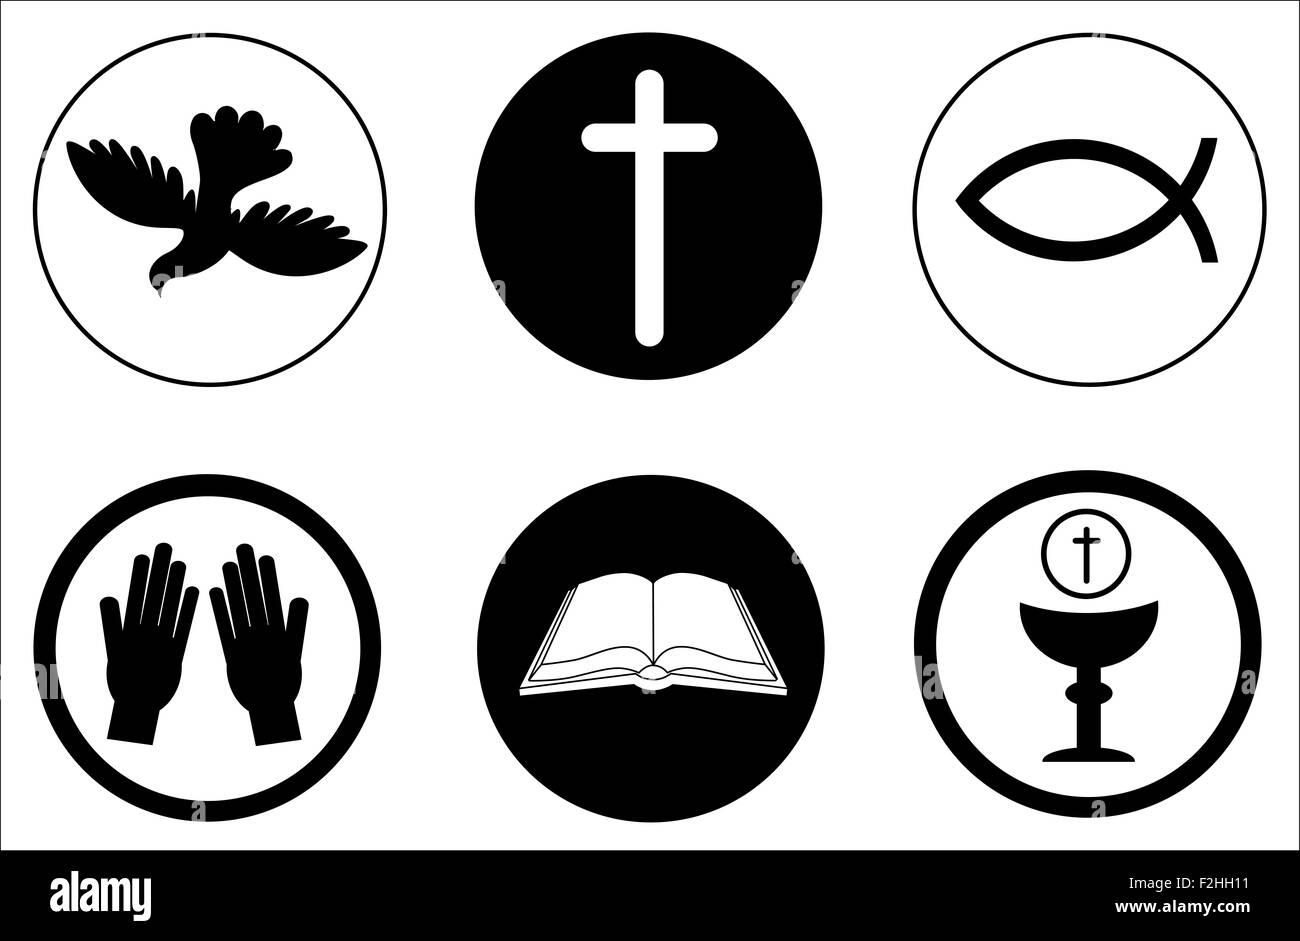 christianity icons and symbols stock photo 87667693 alamy